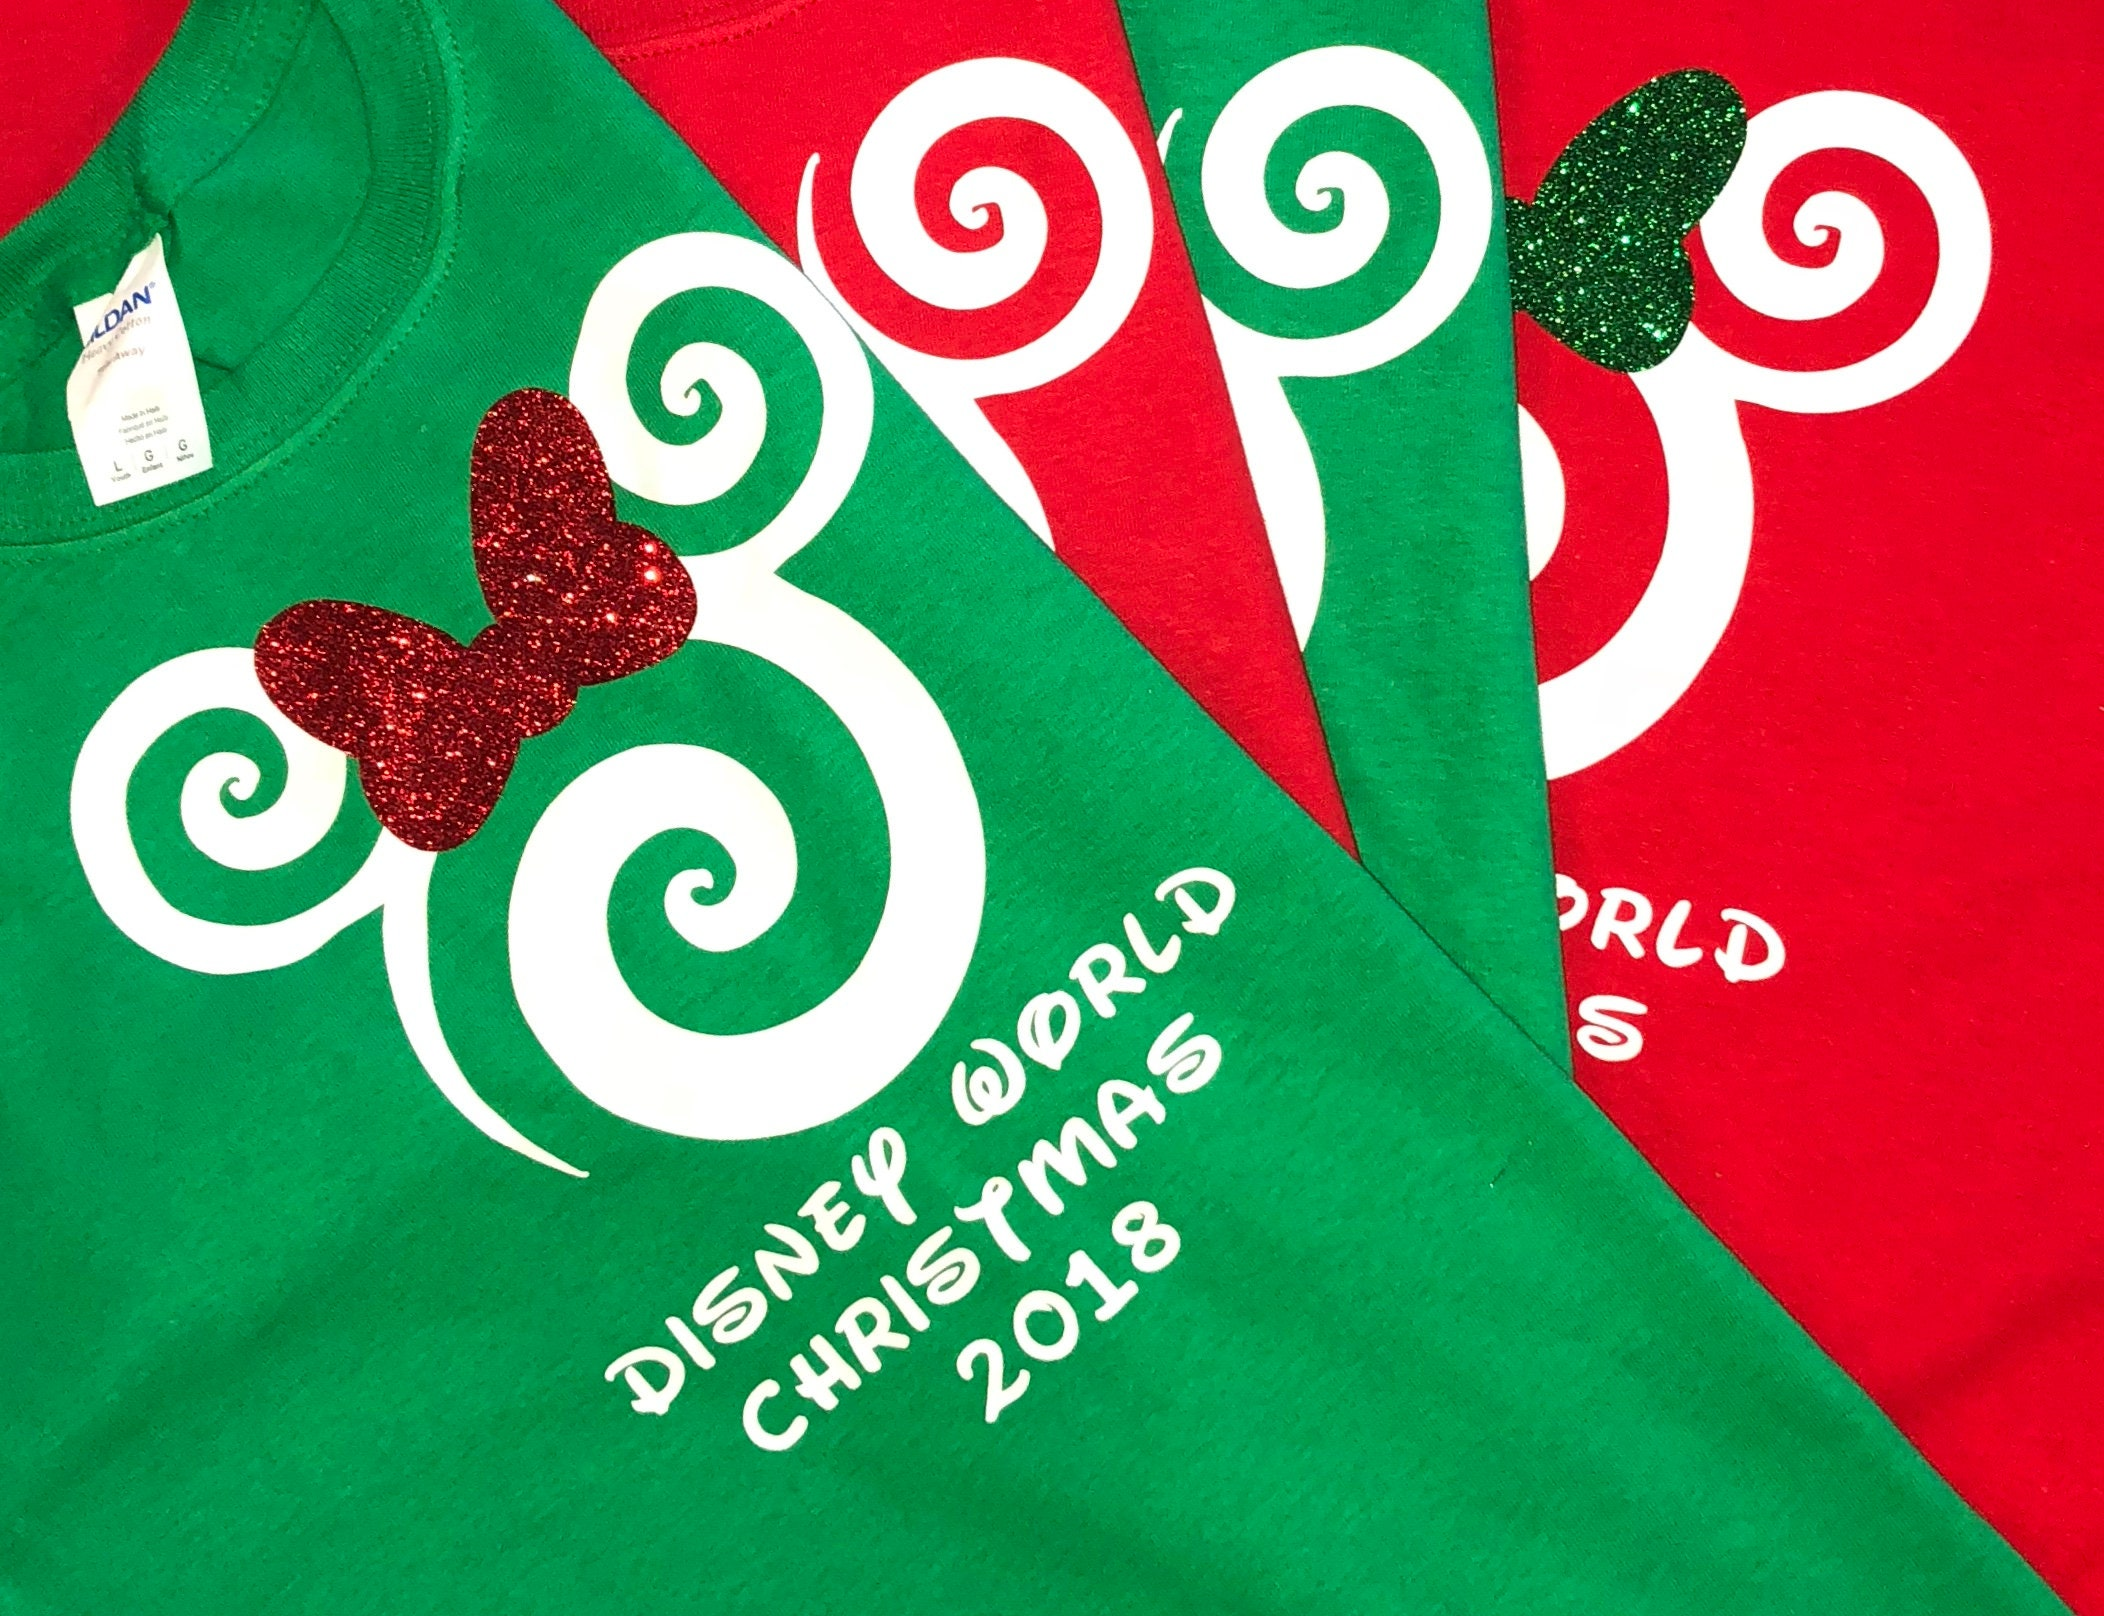 Disney Christmas Shirt Designs.Disney Christmas Shirt Disney Family Shirts Disney Tank Tops Merry Christmas Shirts Snowflake Disney Shirts